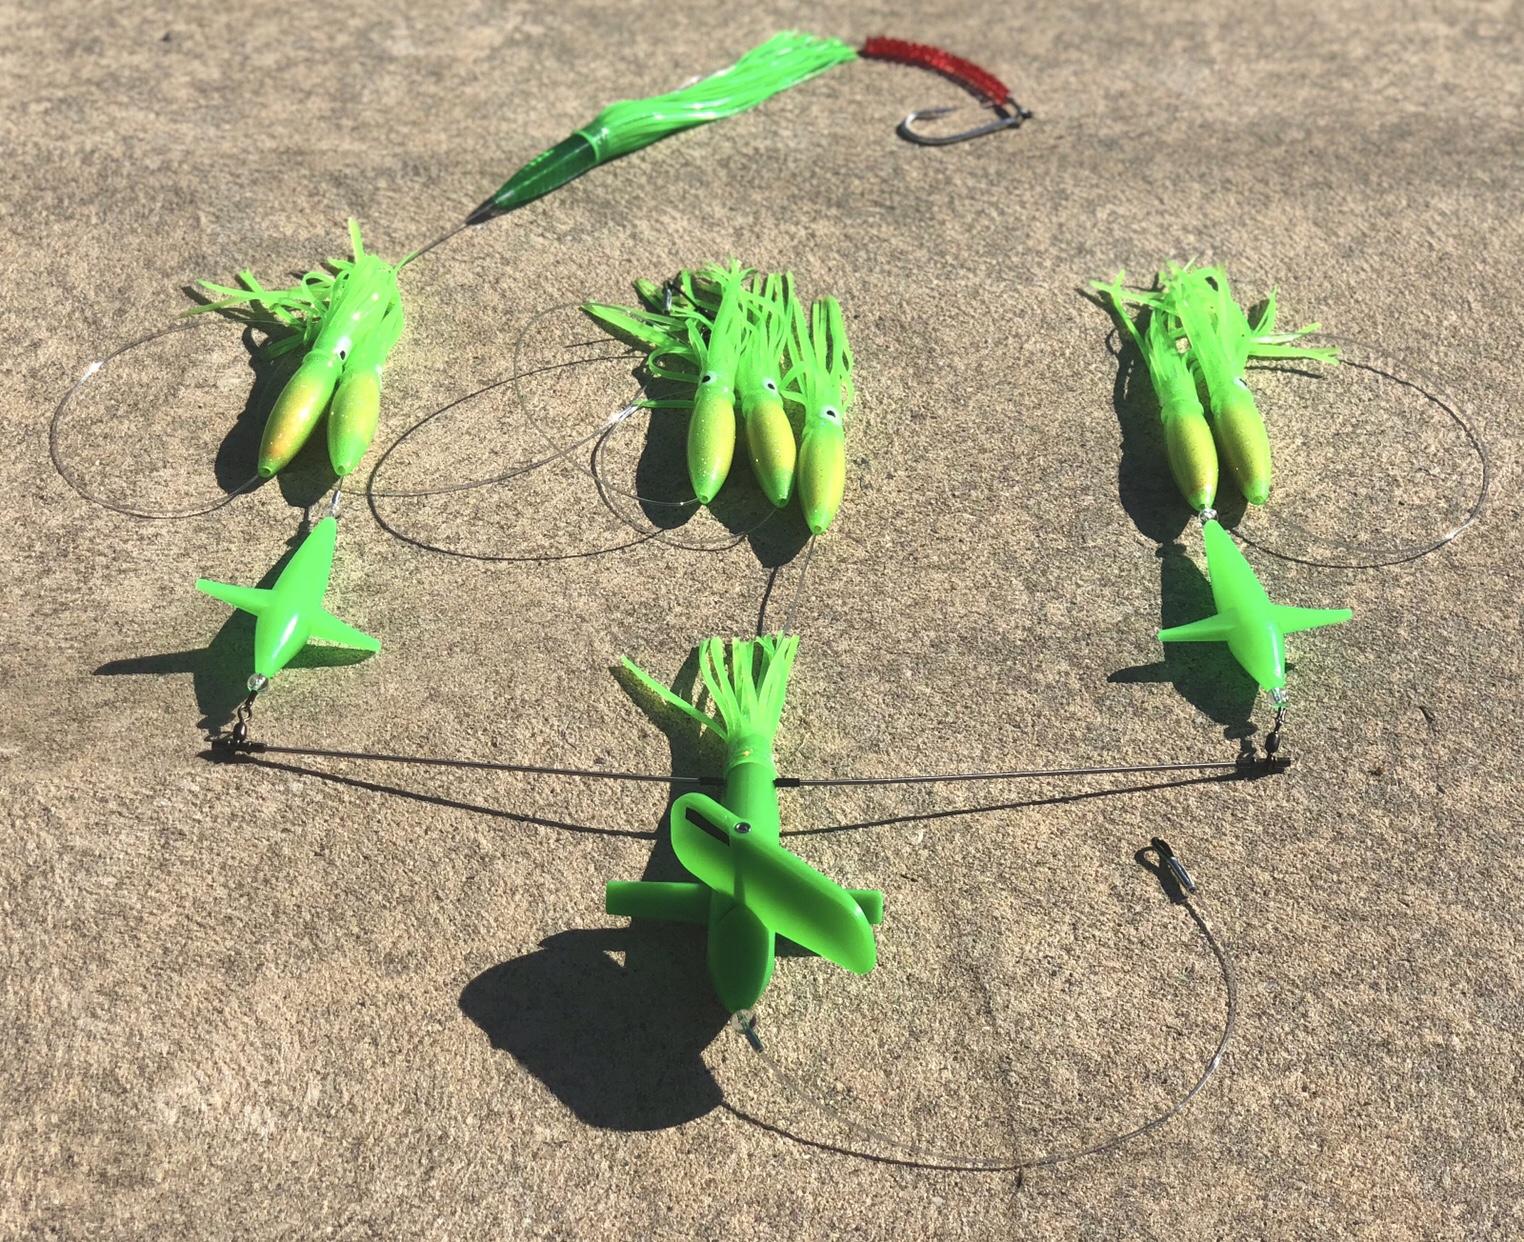 Lbi Fishing Report Update June 15 2018 Nj Origami Nut Spring